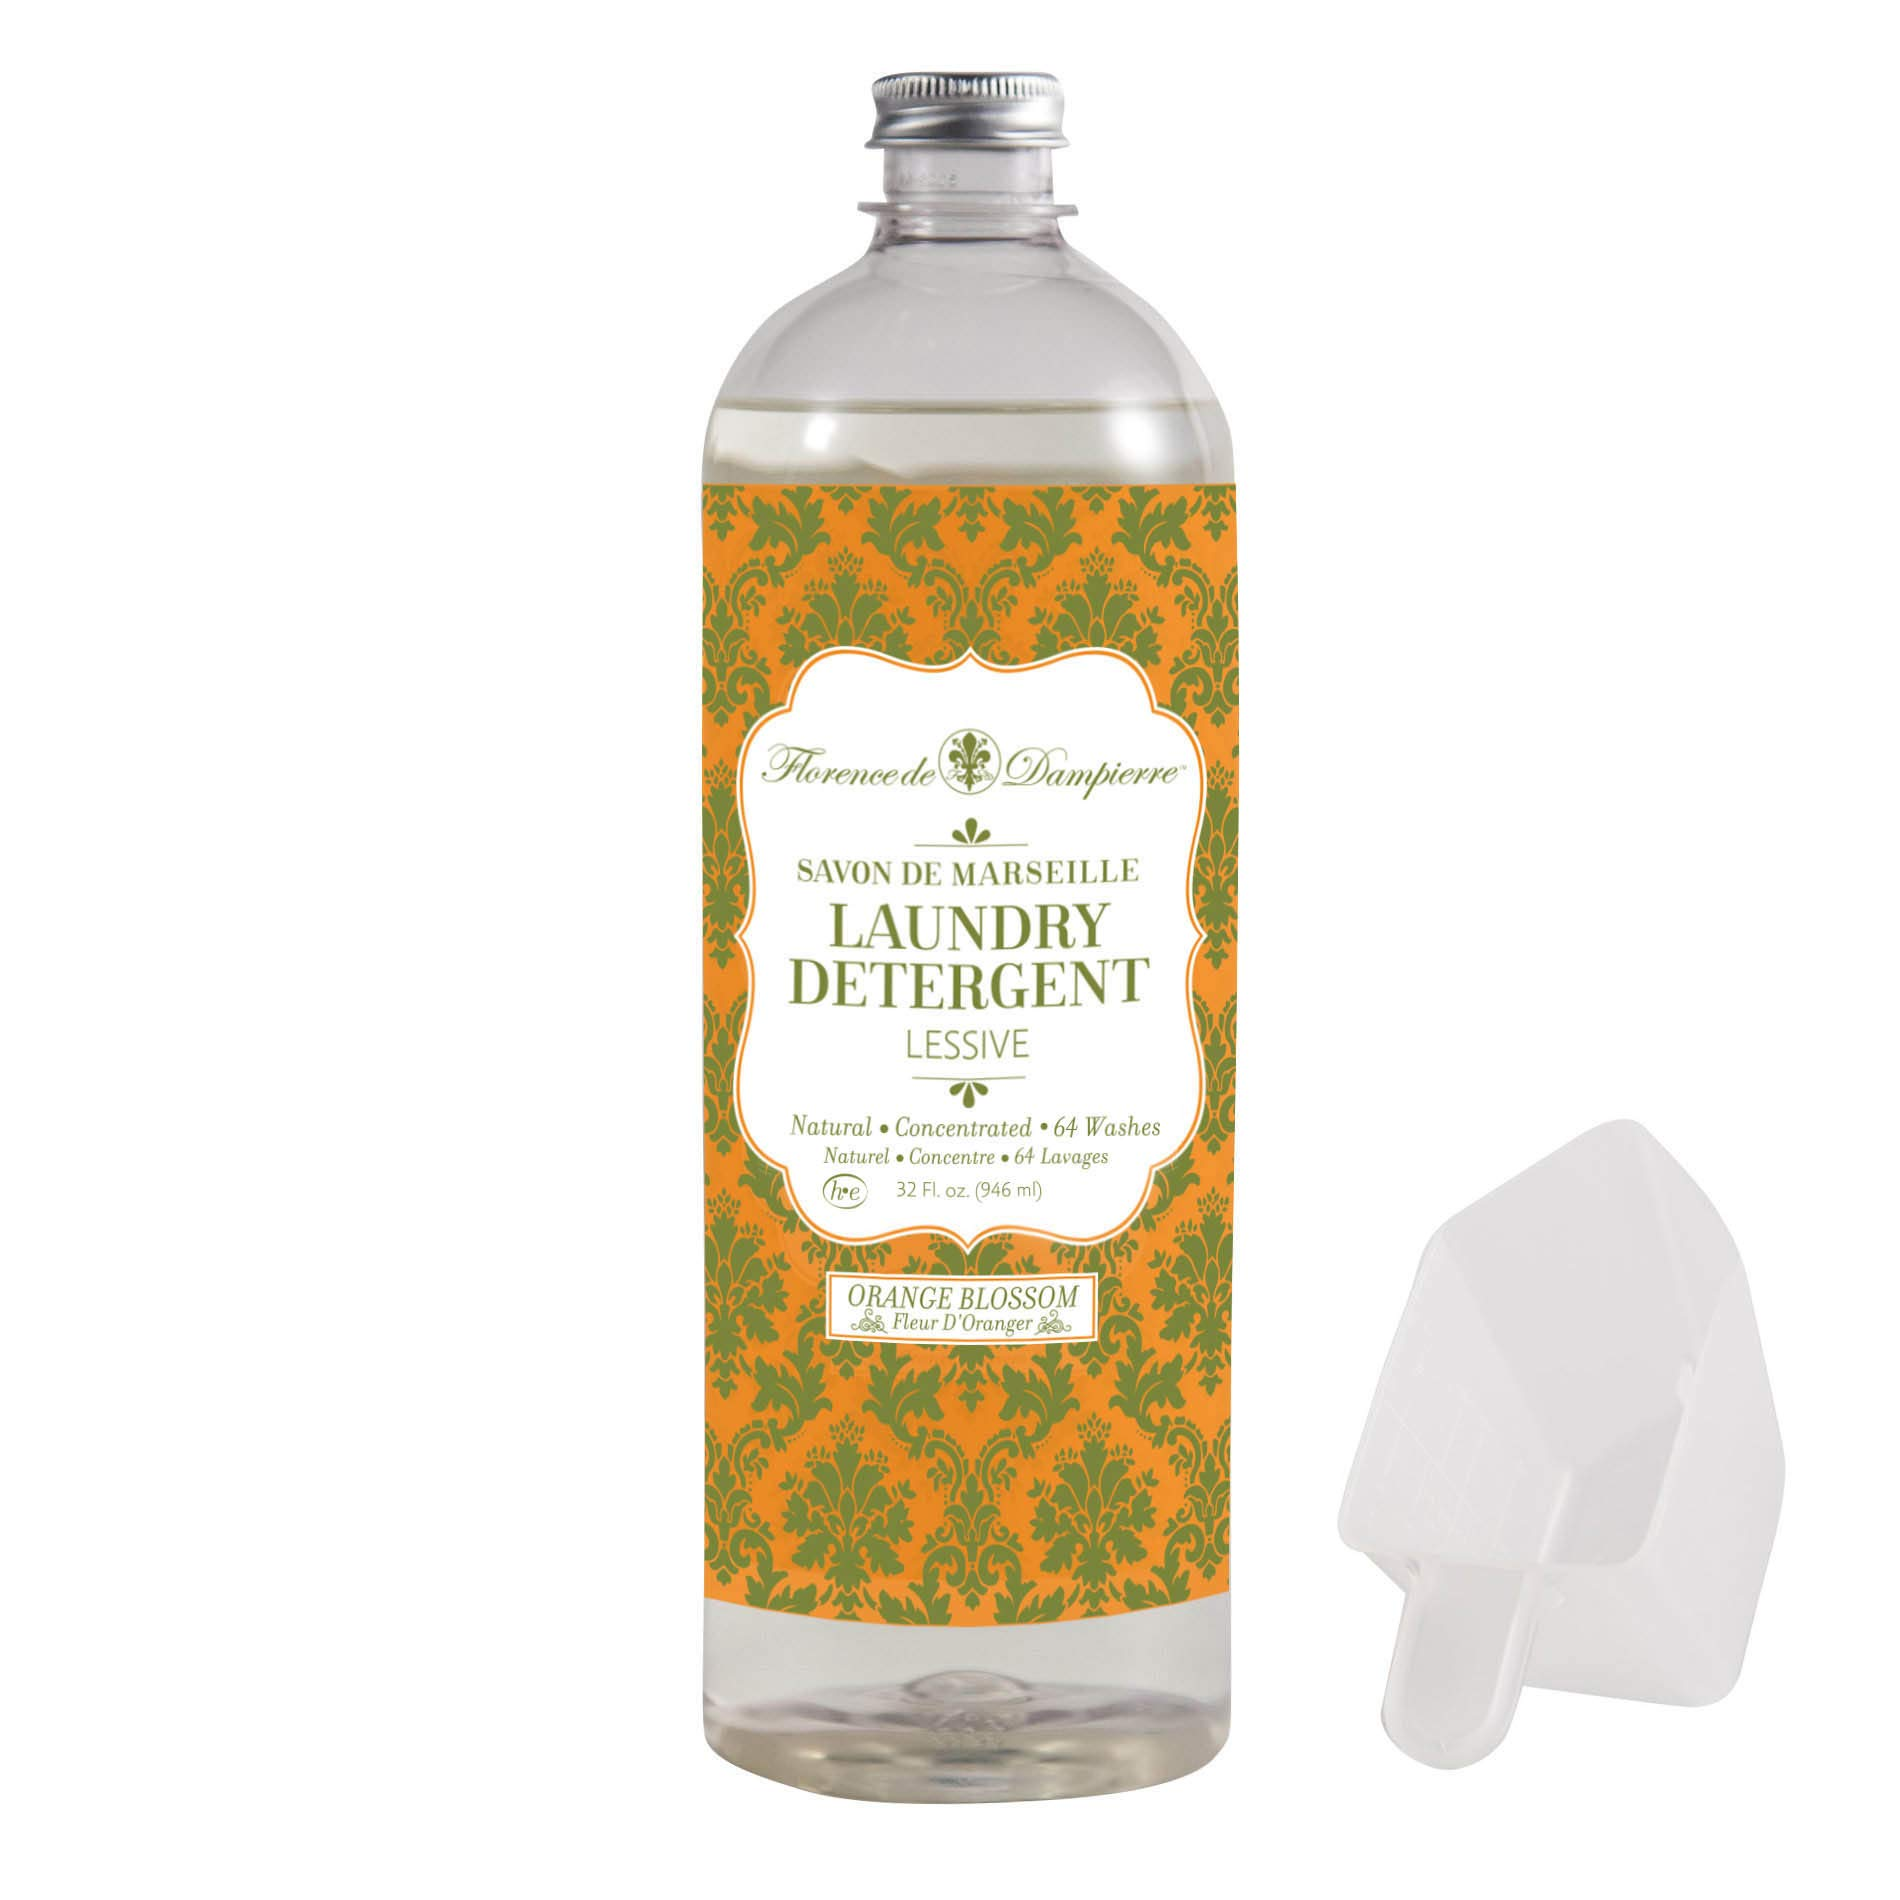 Florence de Dampierre 64 Load, Organic and All-Natural Savon de Marseille Soap, Liquid Laundry Detergent, 32 oz. Orange Blossom